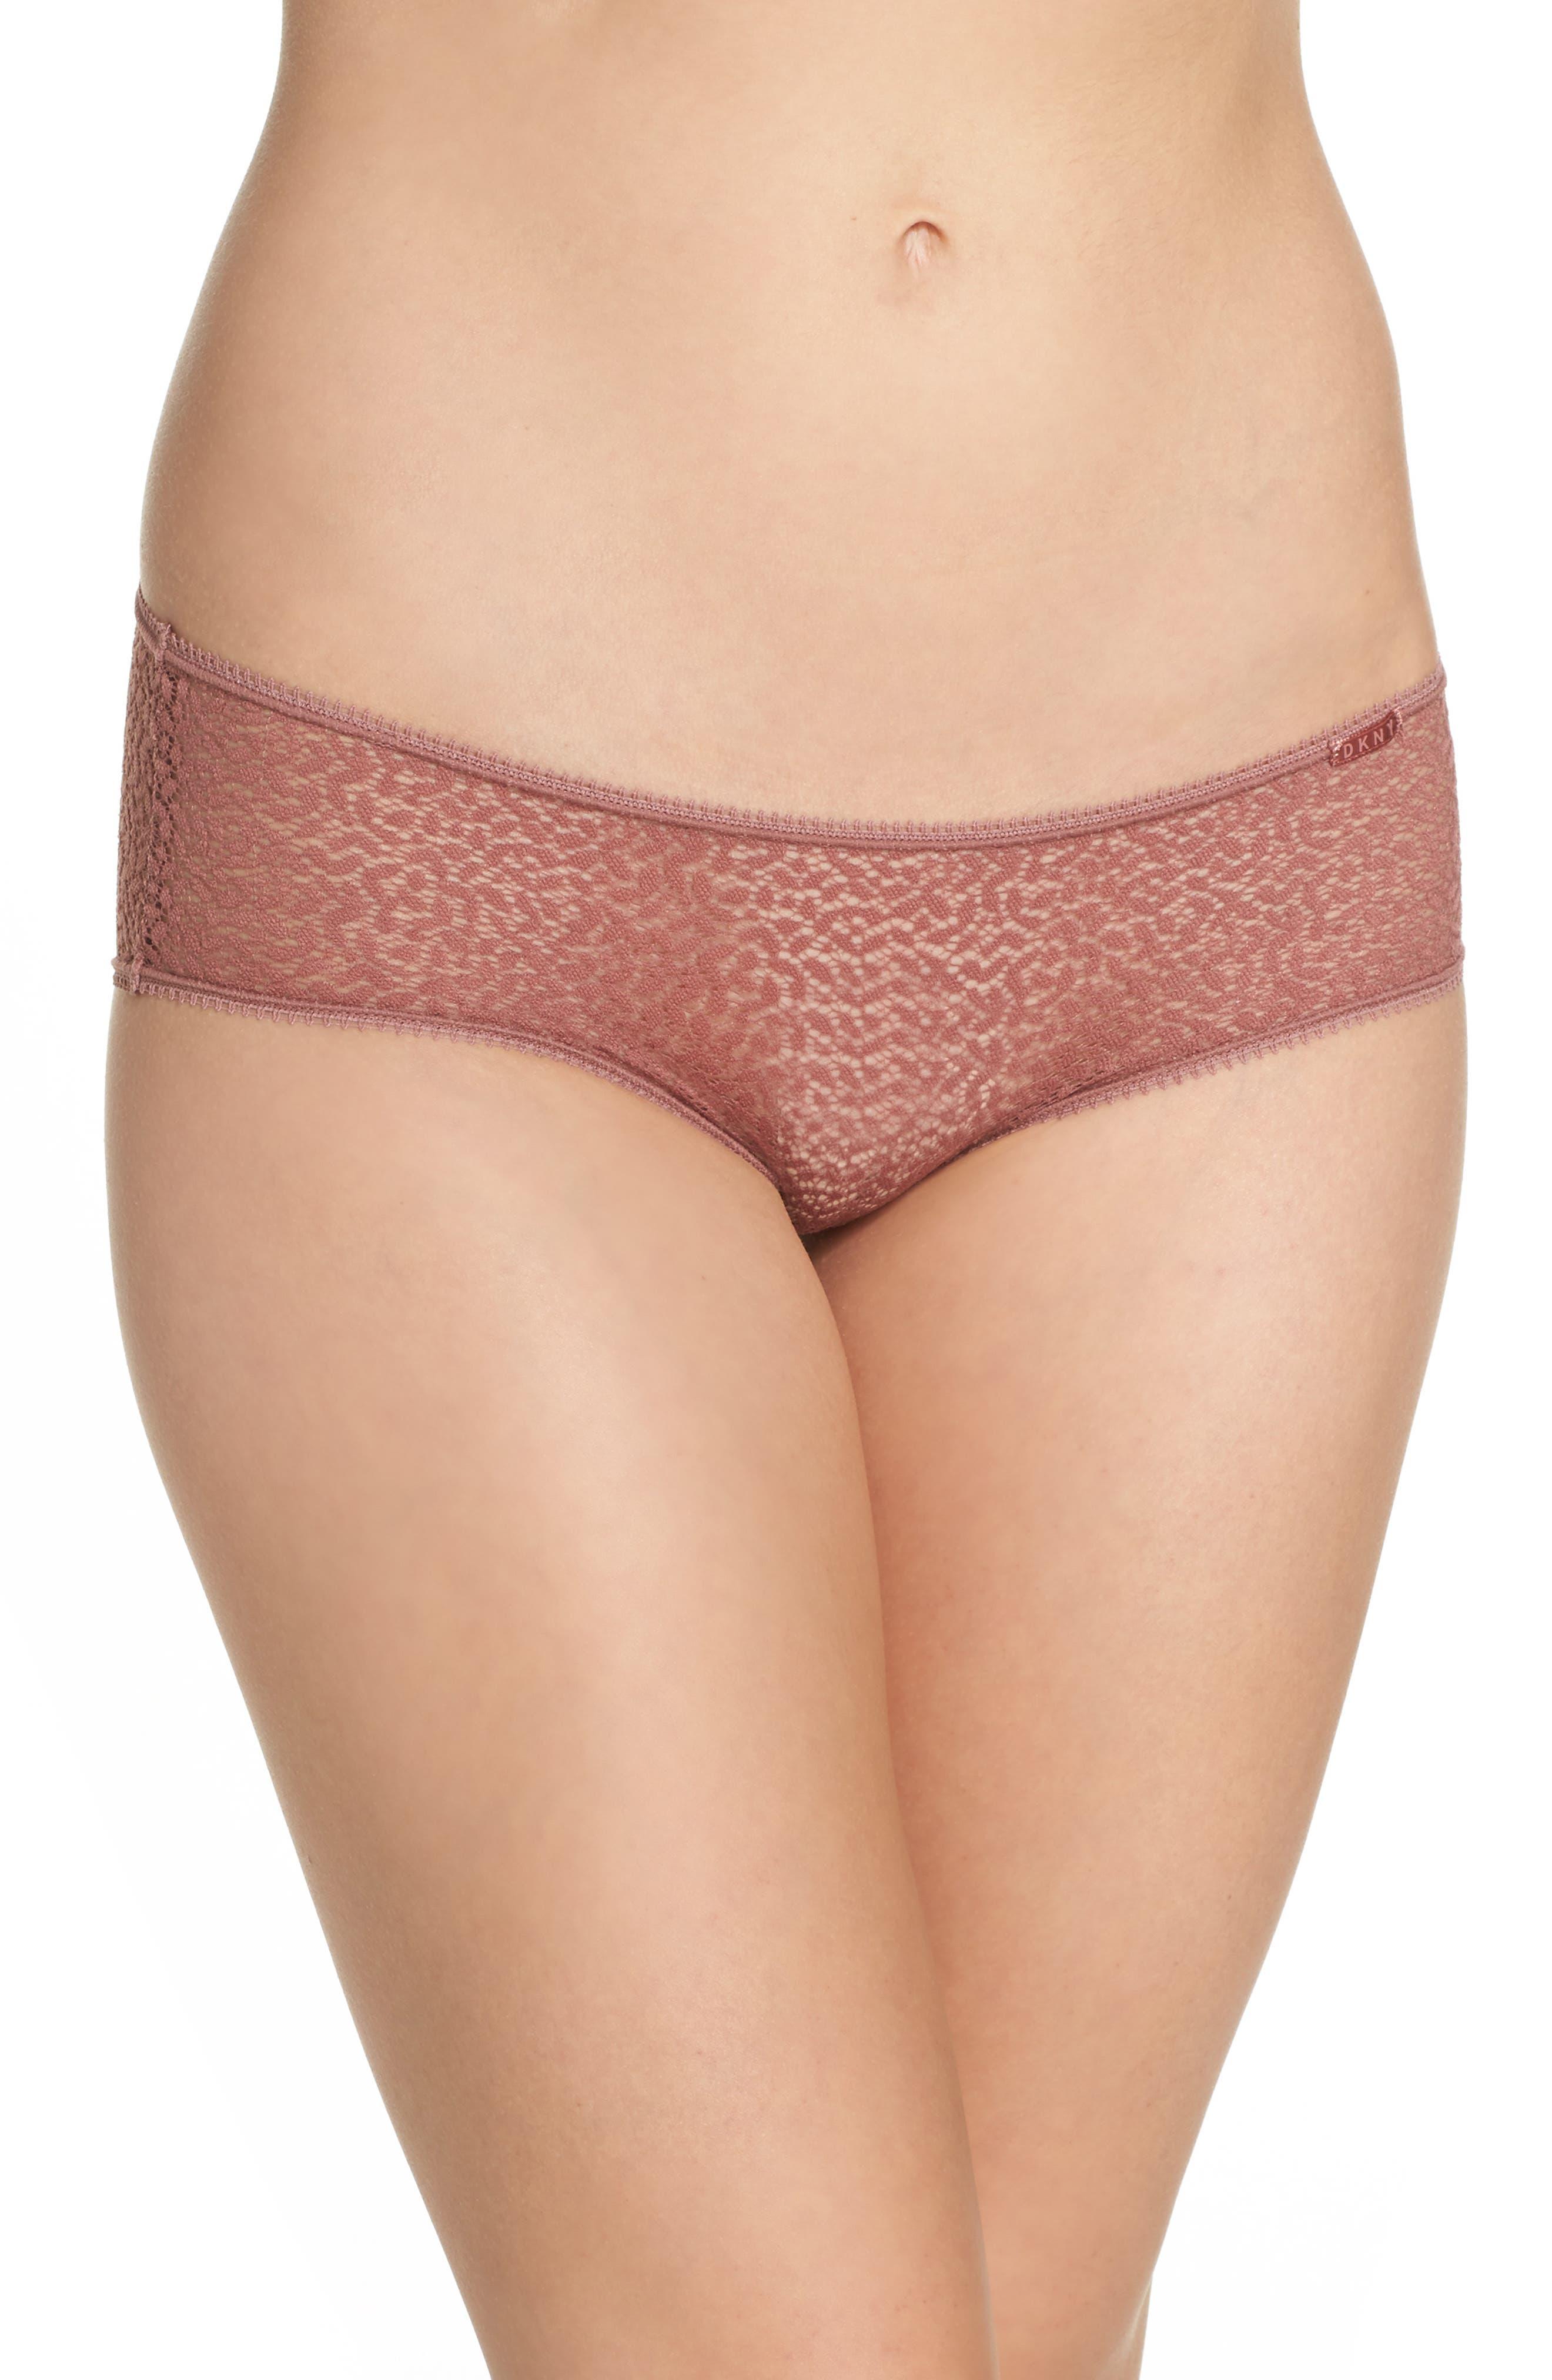 Modern Lace Hipster Panties,                             Main thumbnail 1, color,                             Rosewood 7Nq